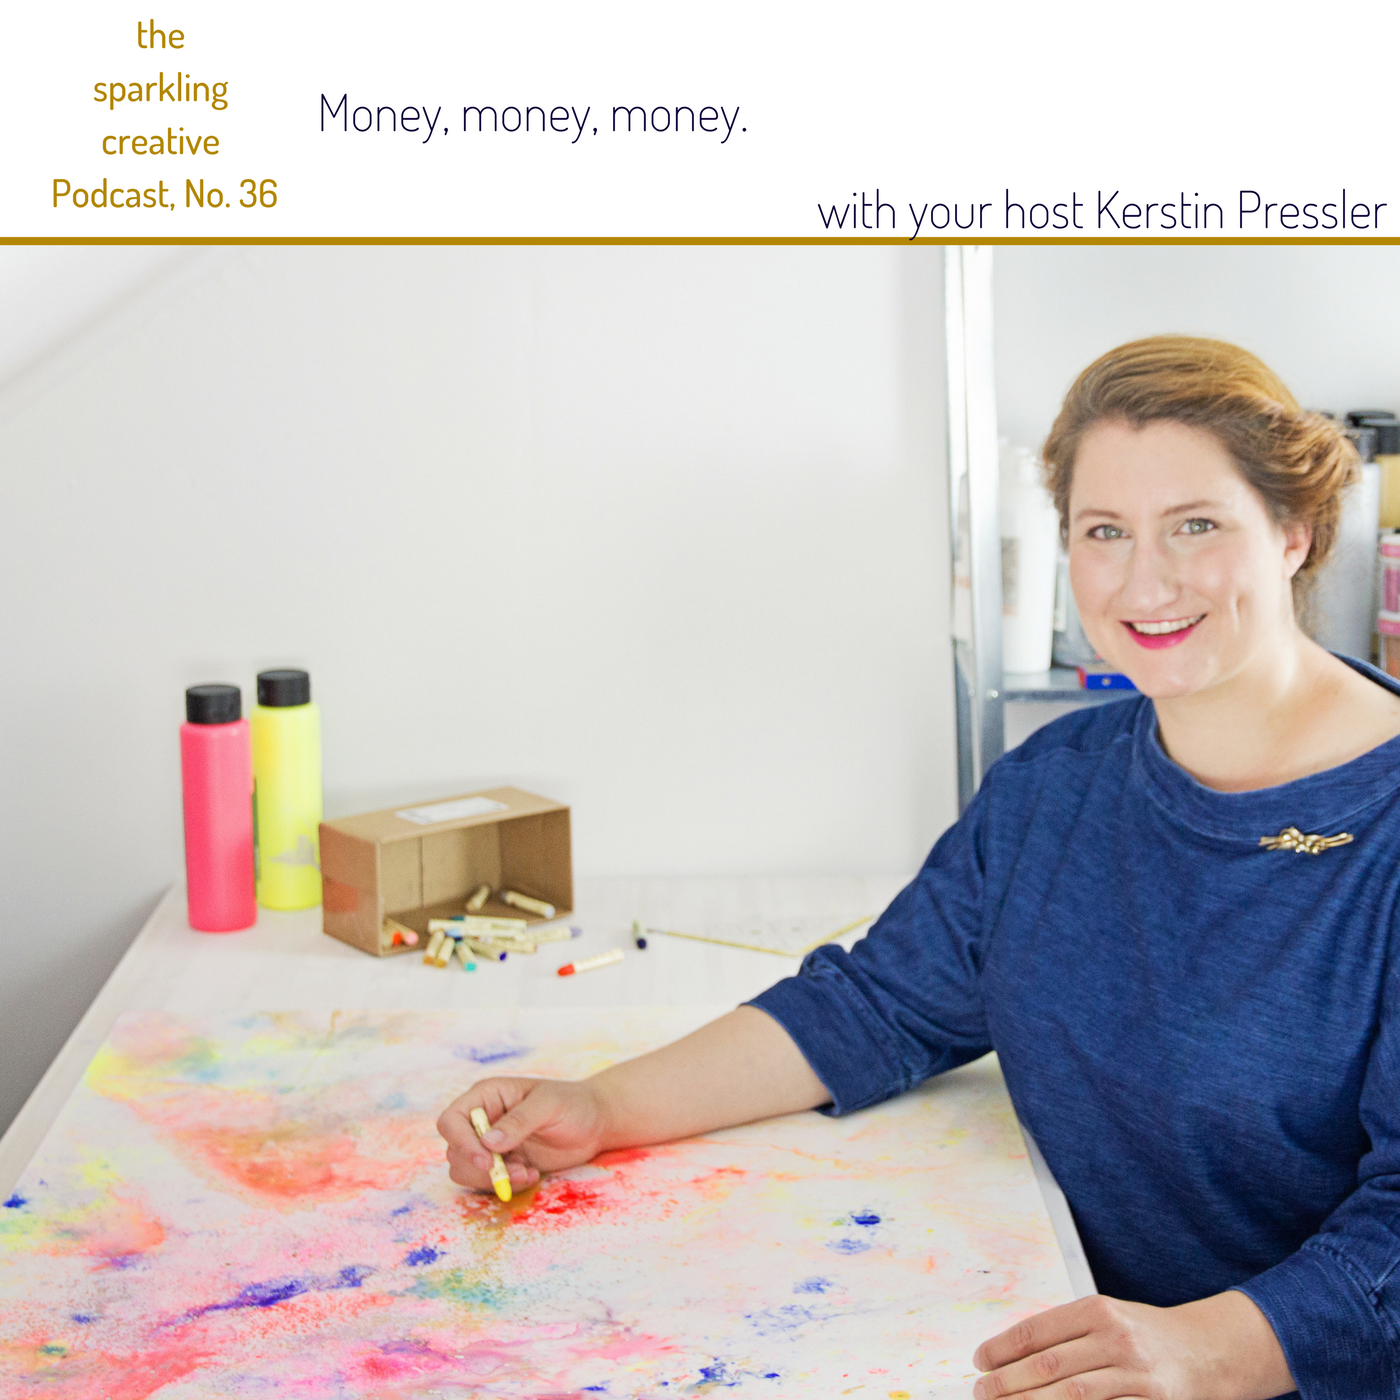 the sparkling creative Podcast, Episode 36: money, money, money, Kerstin Pressler. www.kerstinpressler.com/blog-27episode36